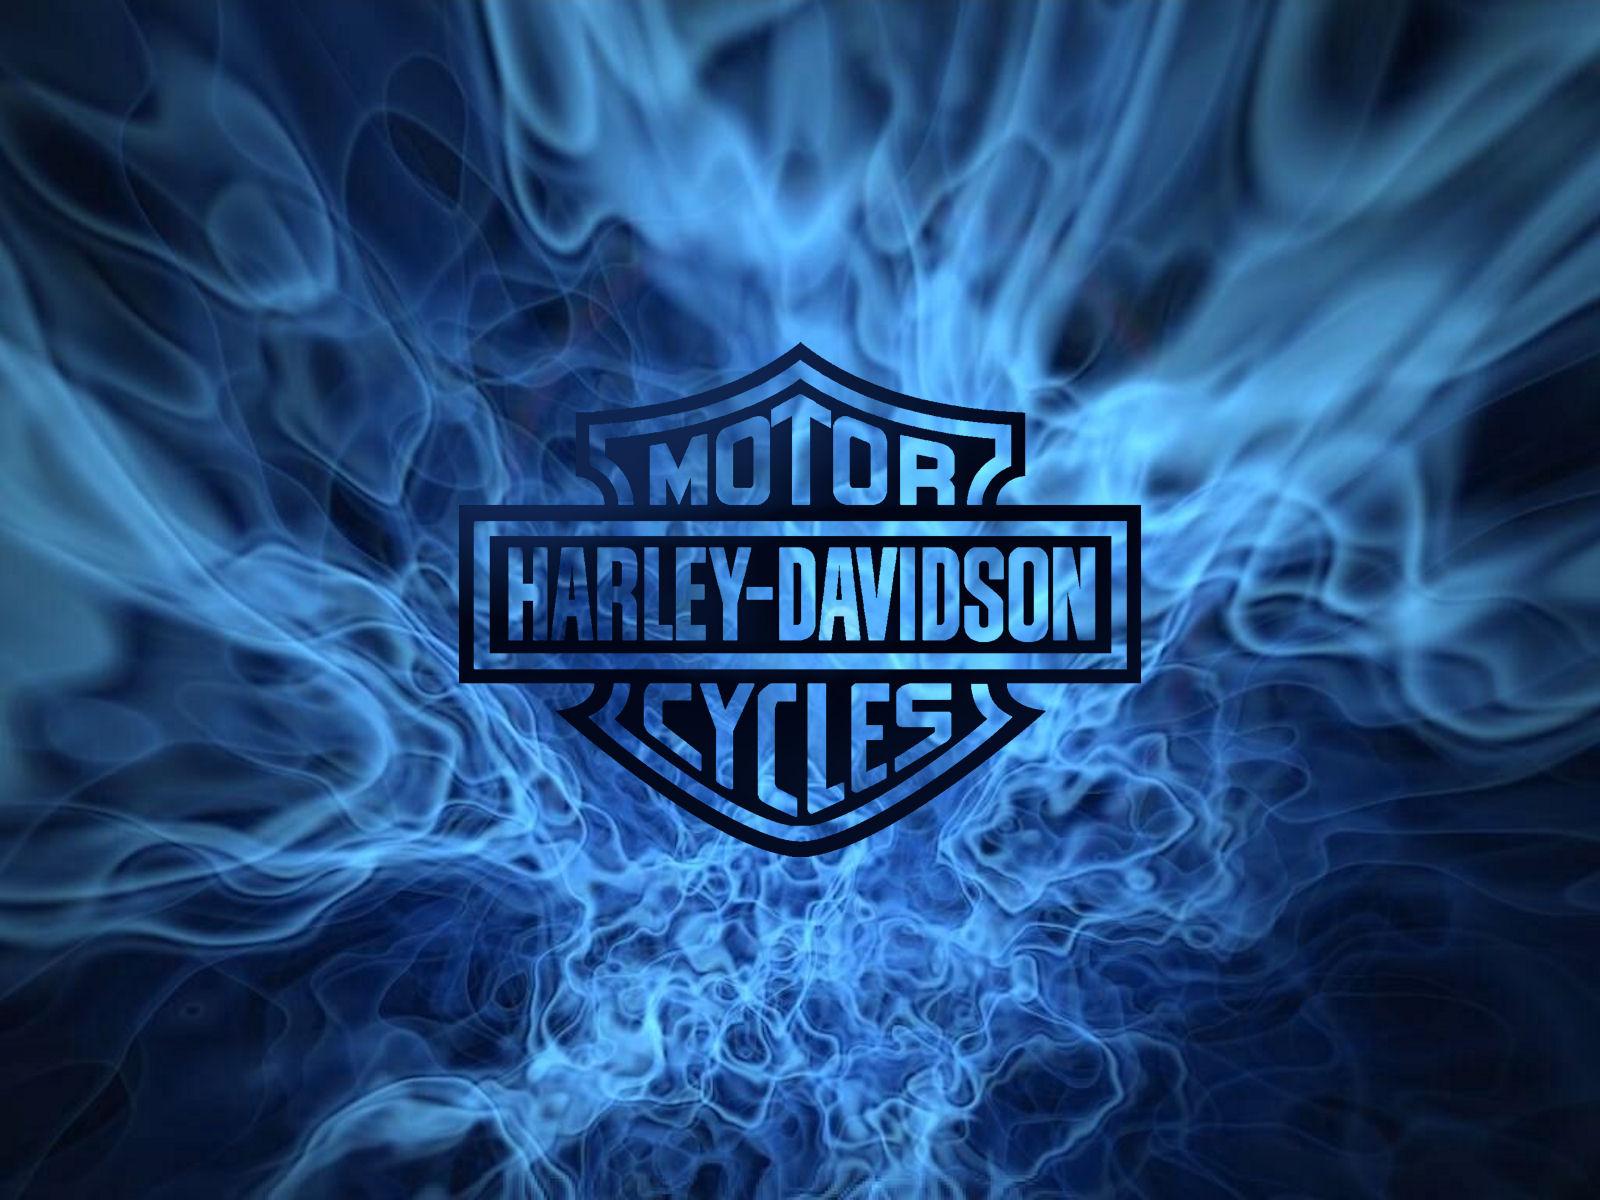 Harley Davidson Logo Clodo Sauvage